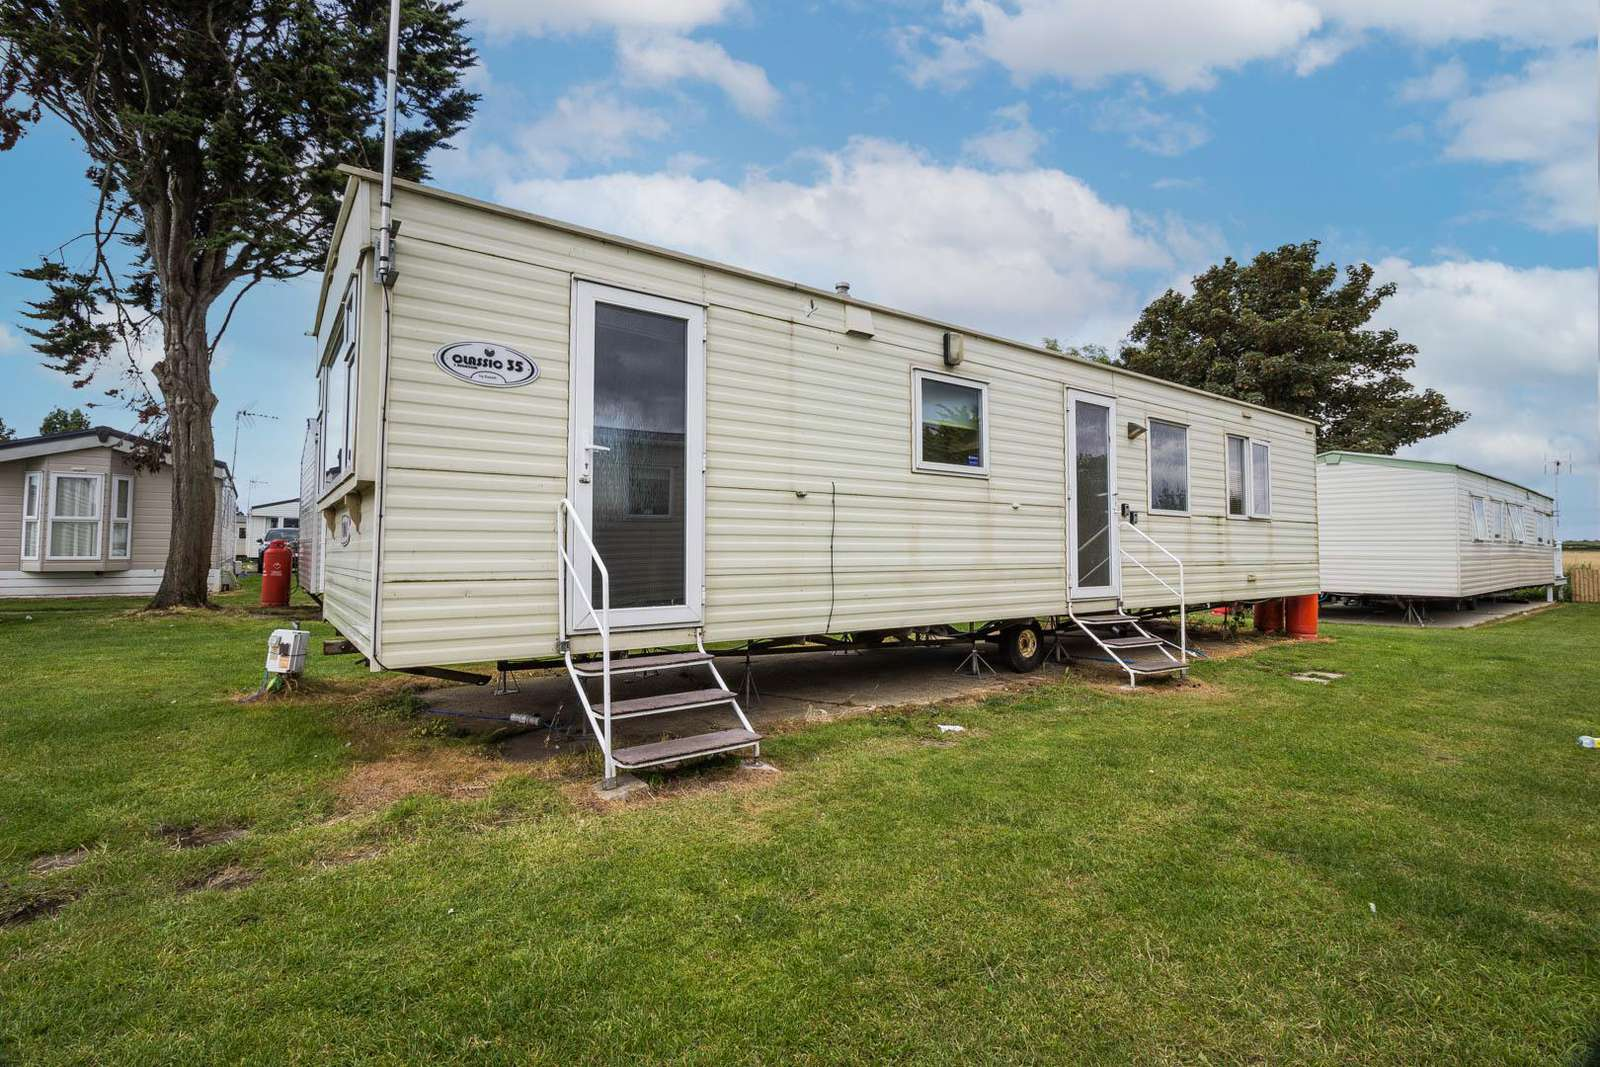 27022S – S area, Seawick, 3 bed, 8 berth caravan. Emerald rated. - property